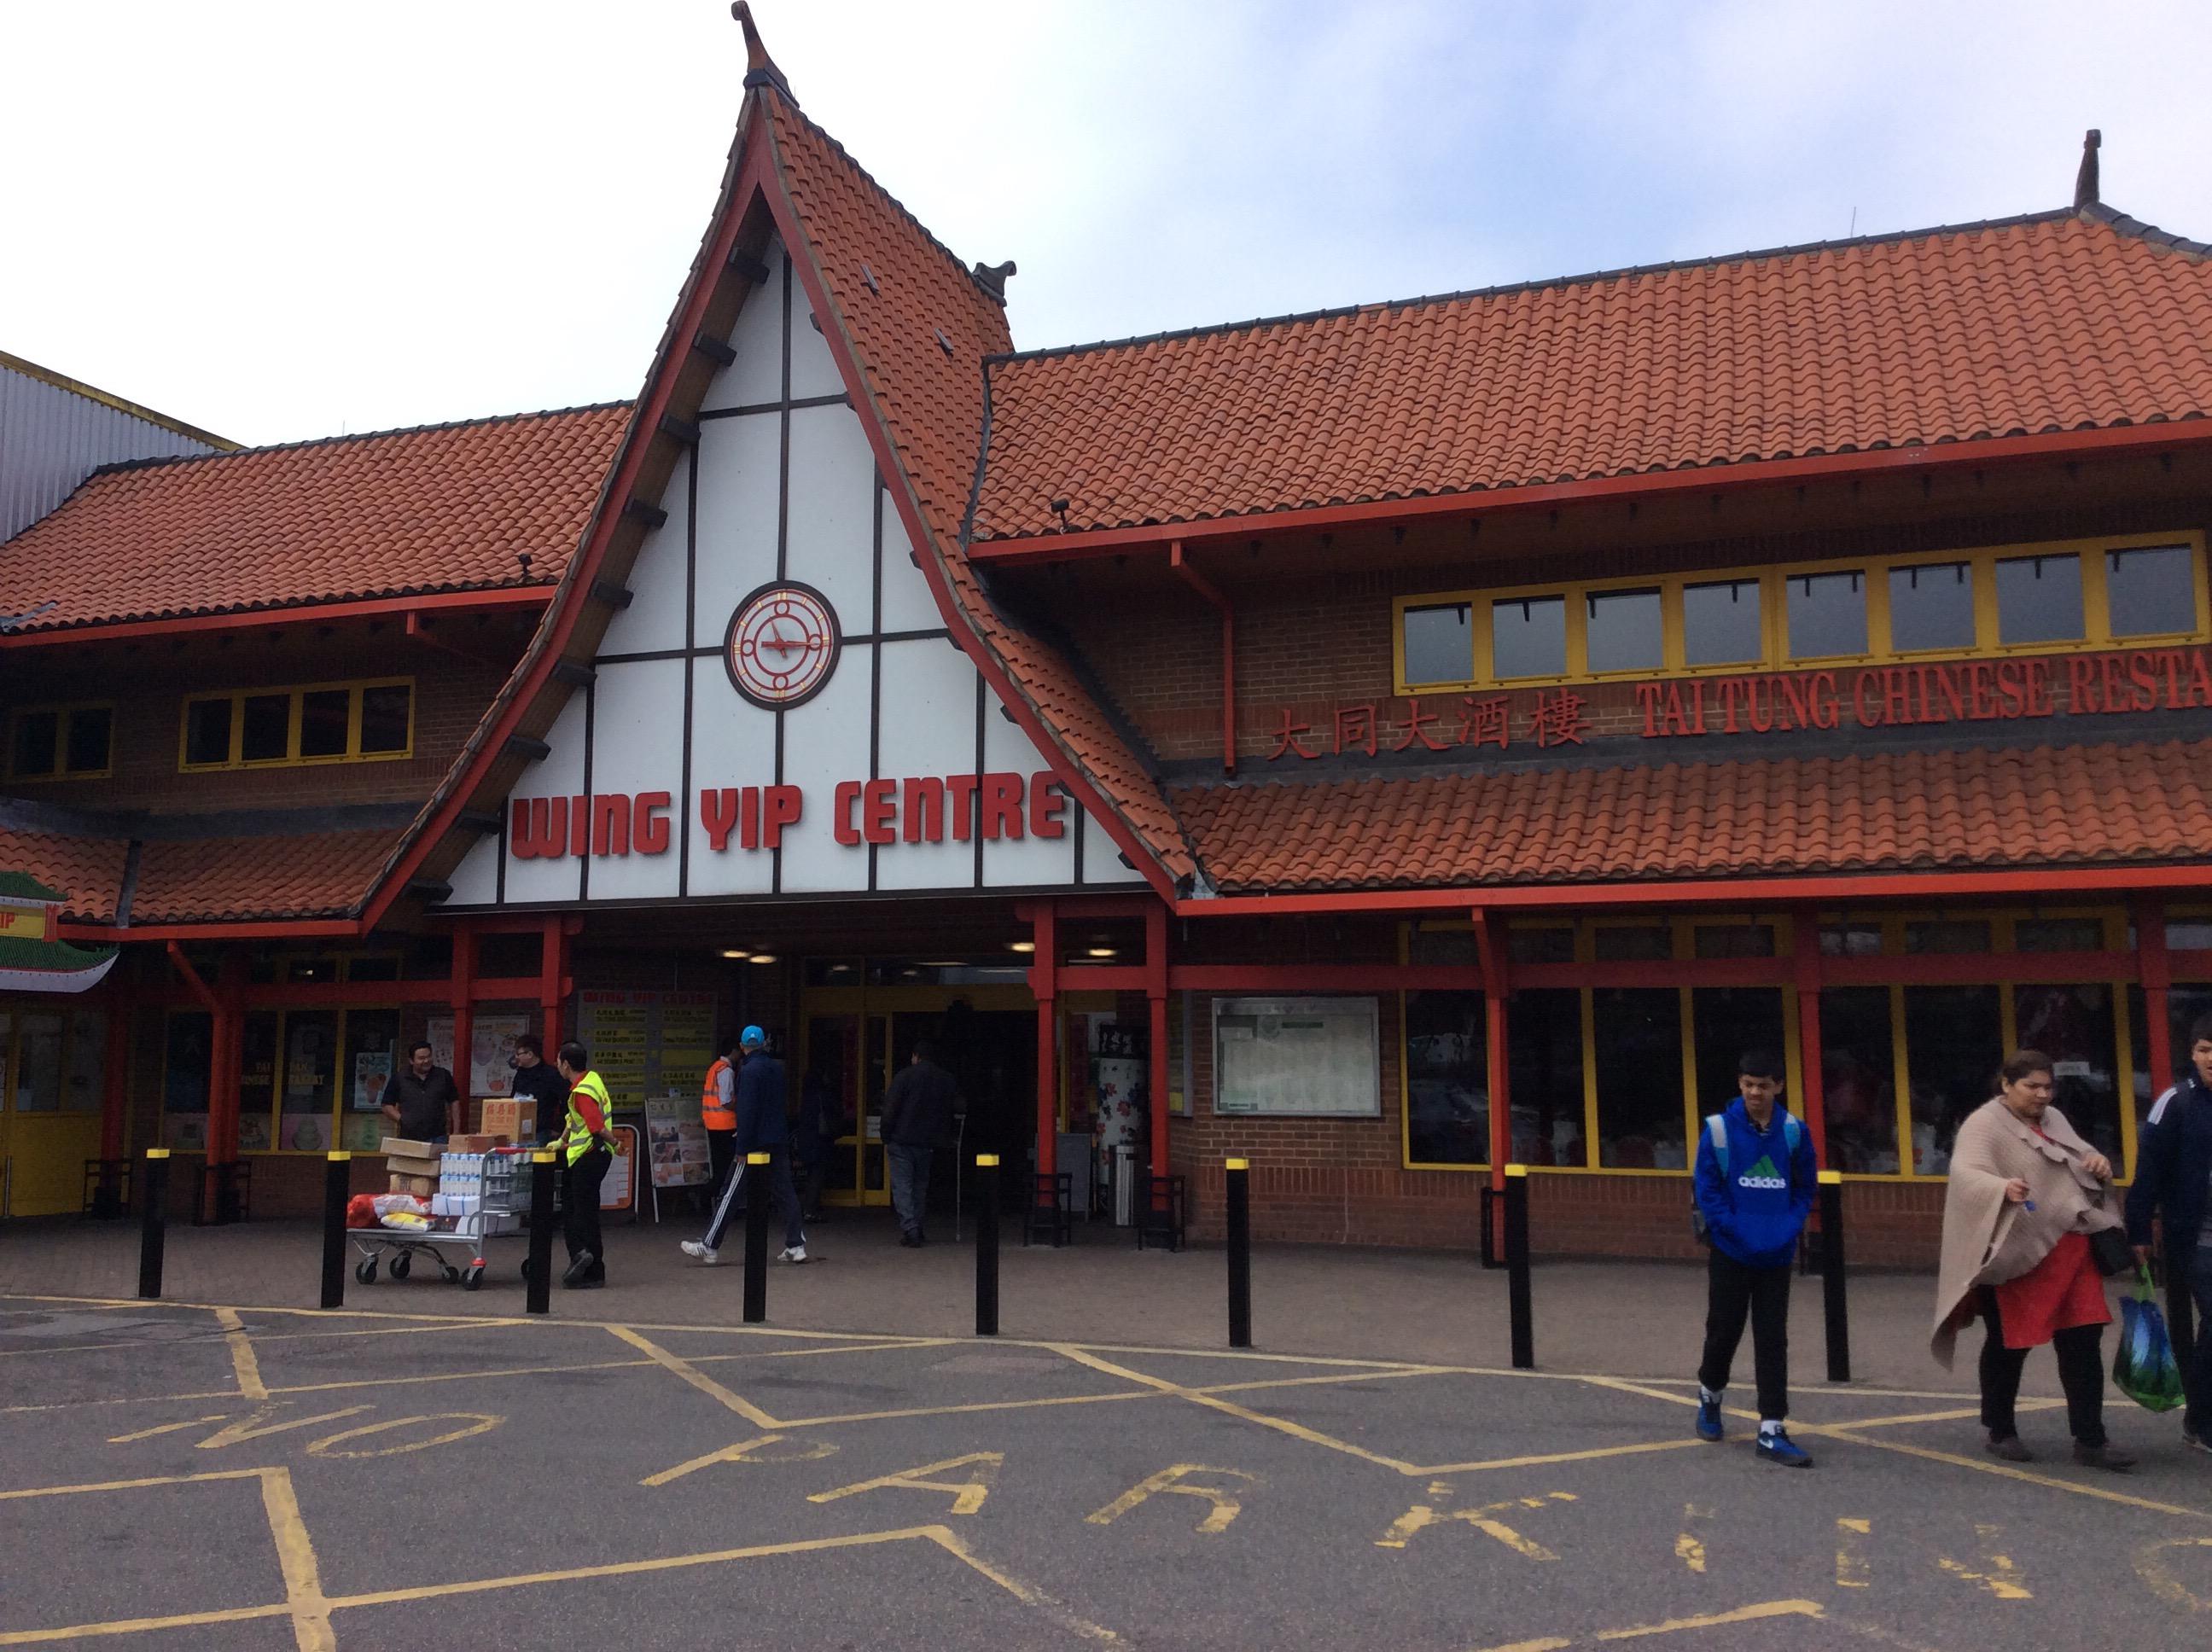 wing yip centre  croydon  u2013 gyppo travel reviews